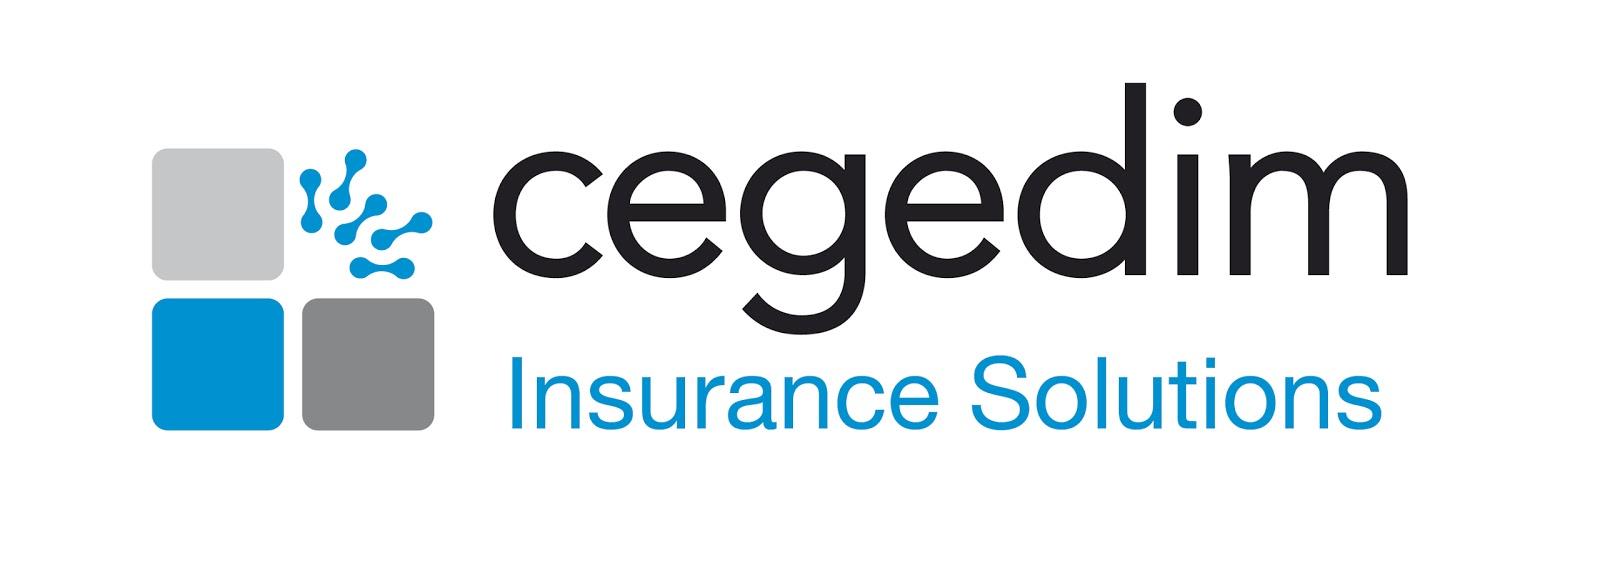 Cegedim Insurance Solutions